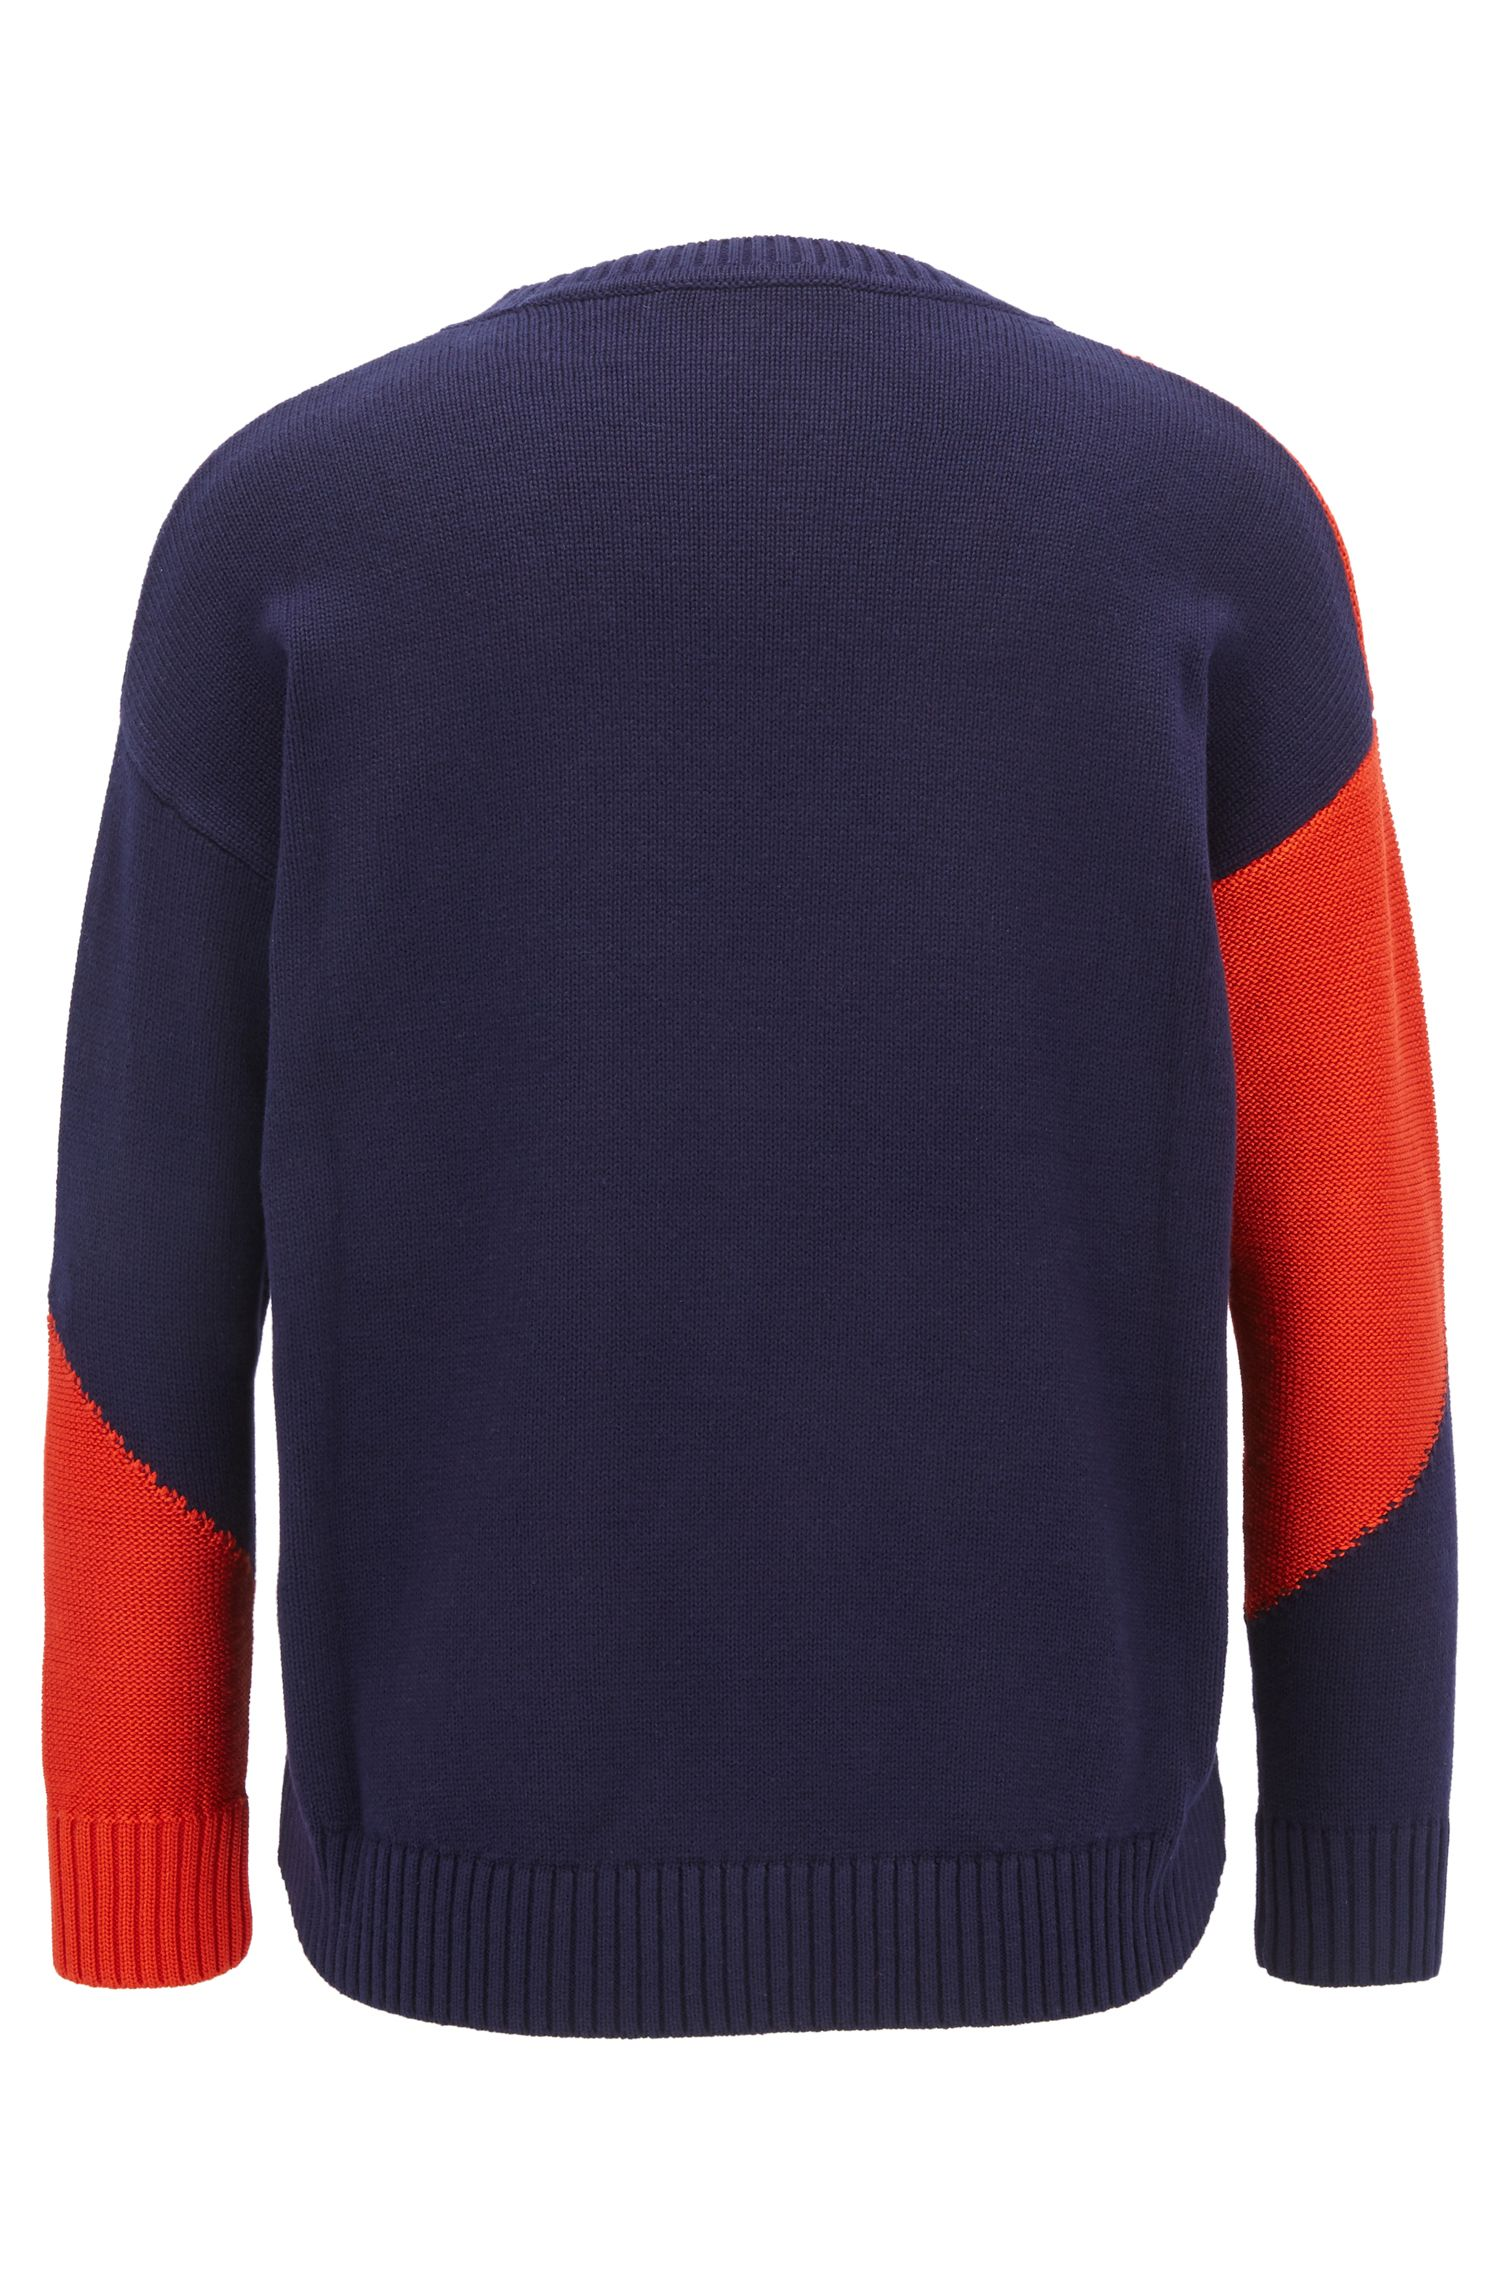 Bird Intarsia Sweater | Fabby